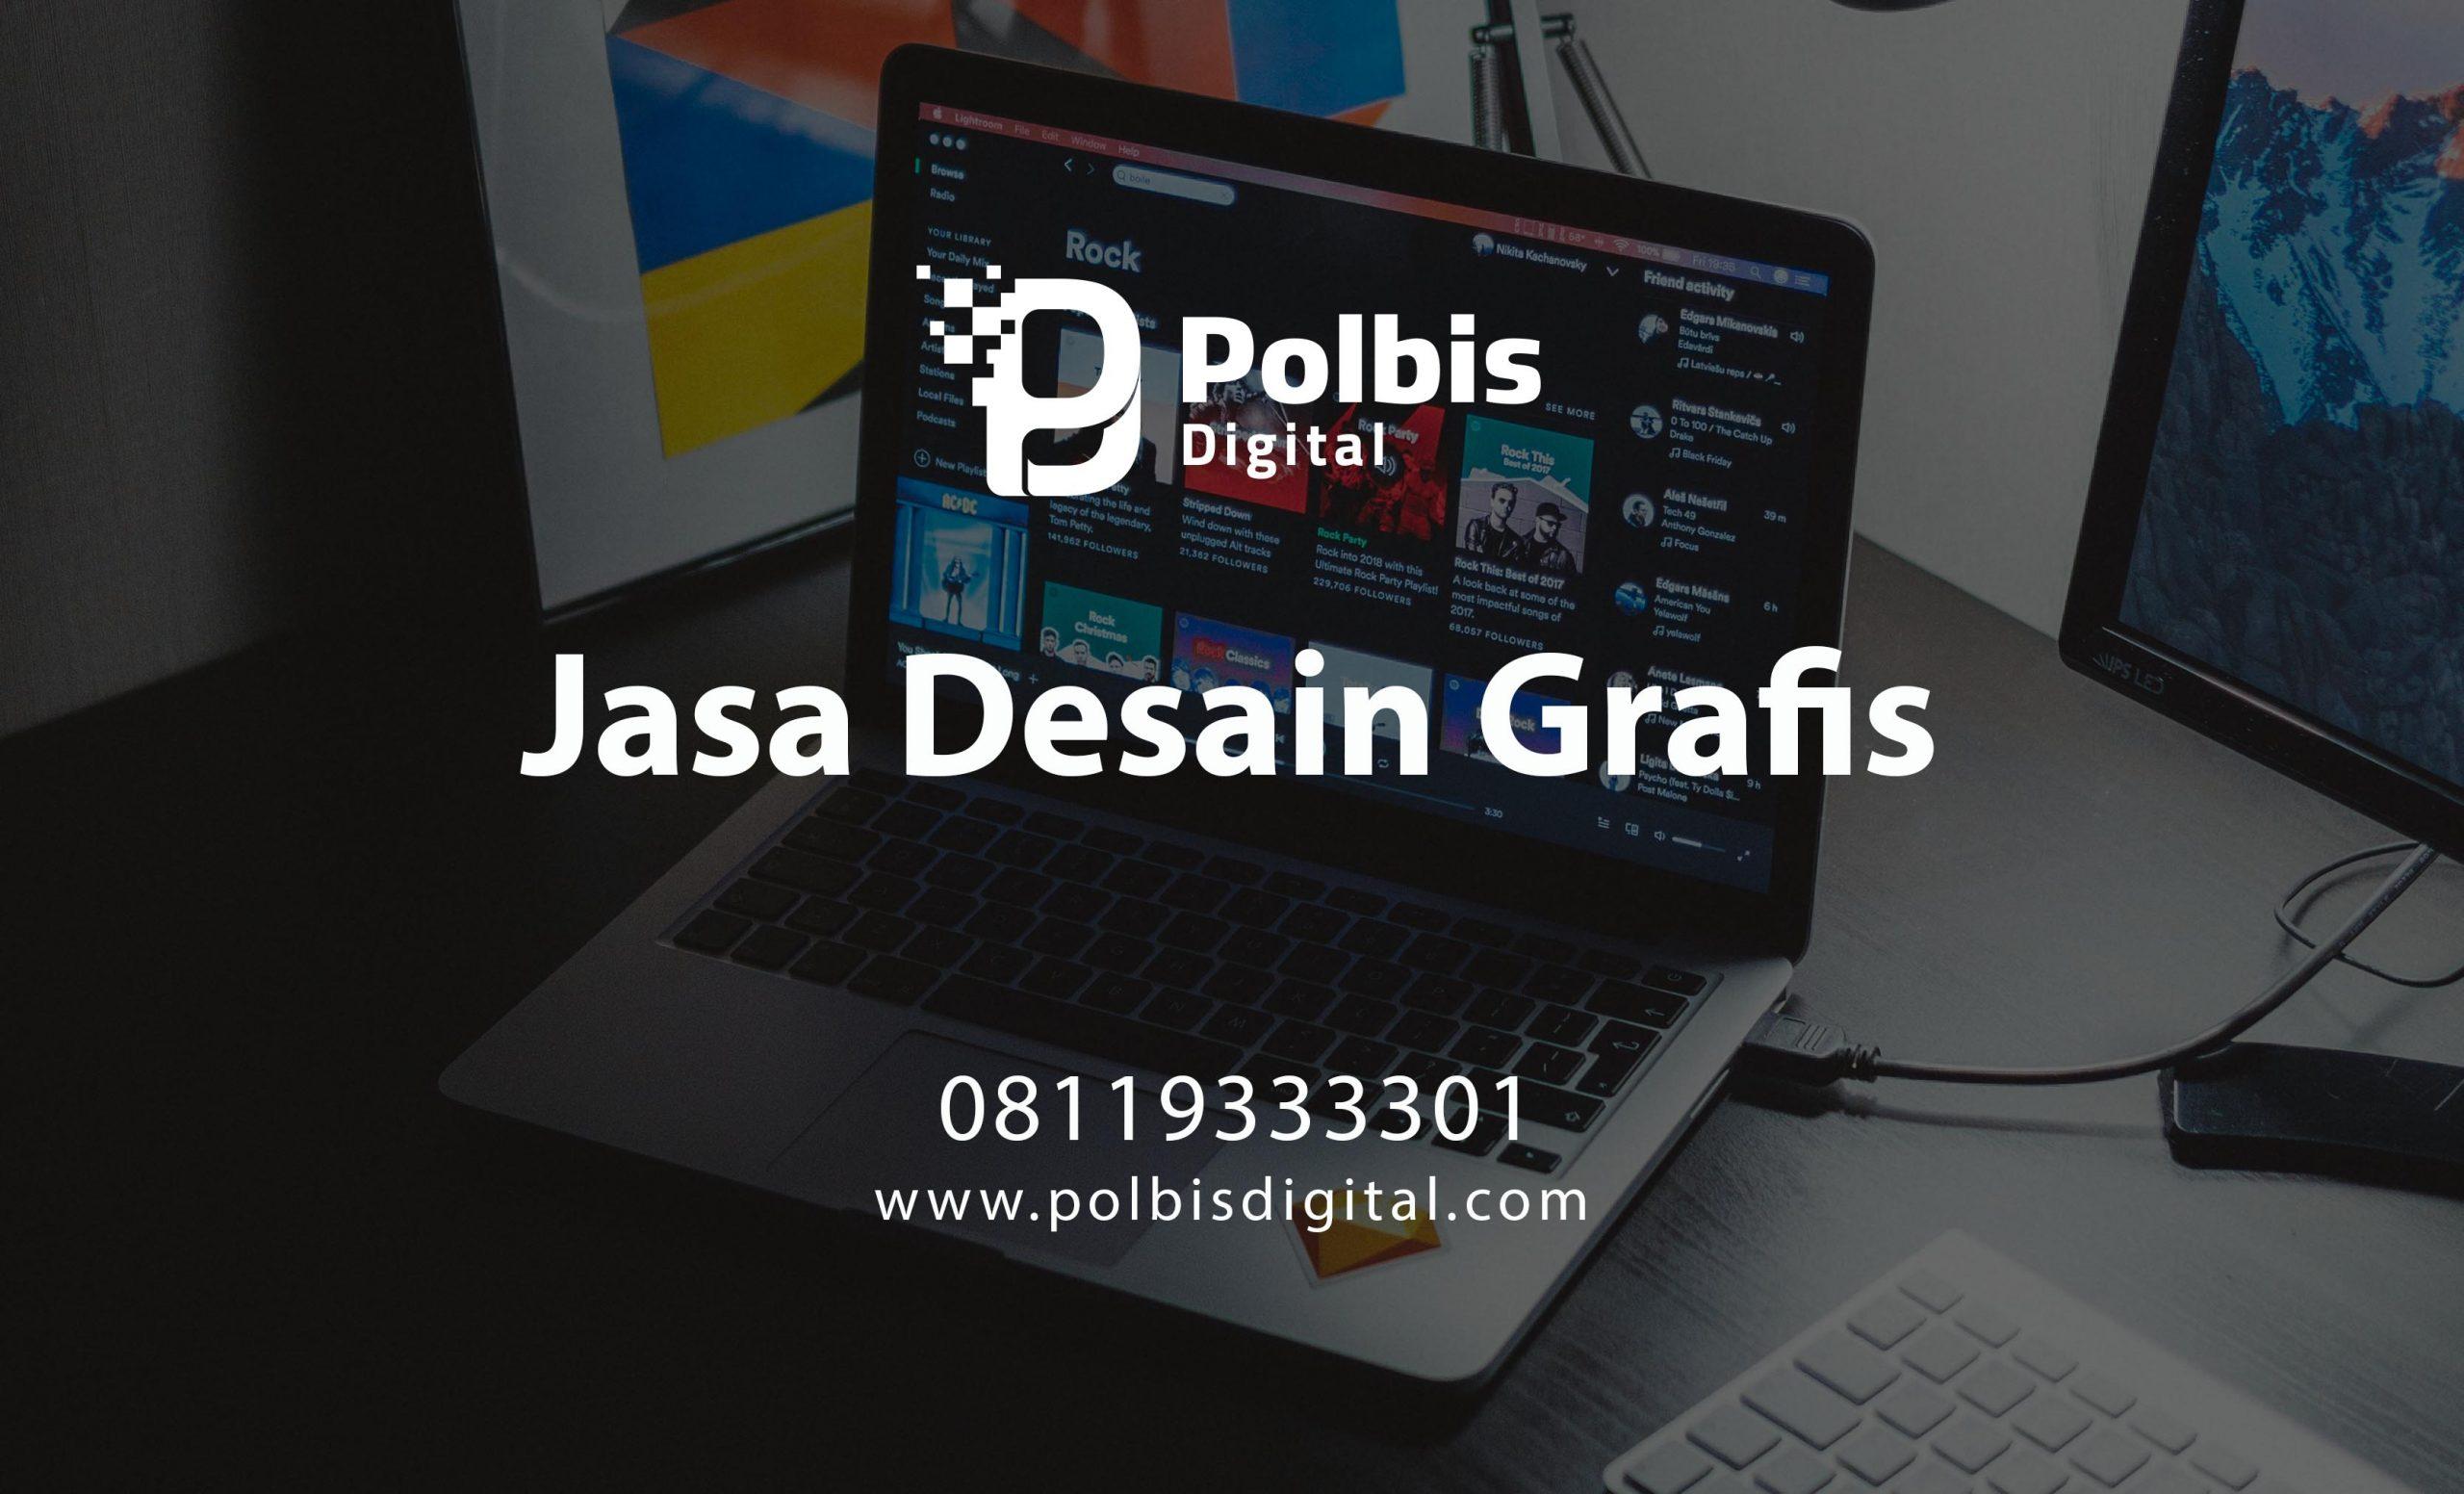 JASA DESAIN GRAFIS MALUKU TENGAH